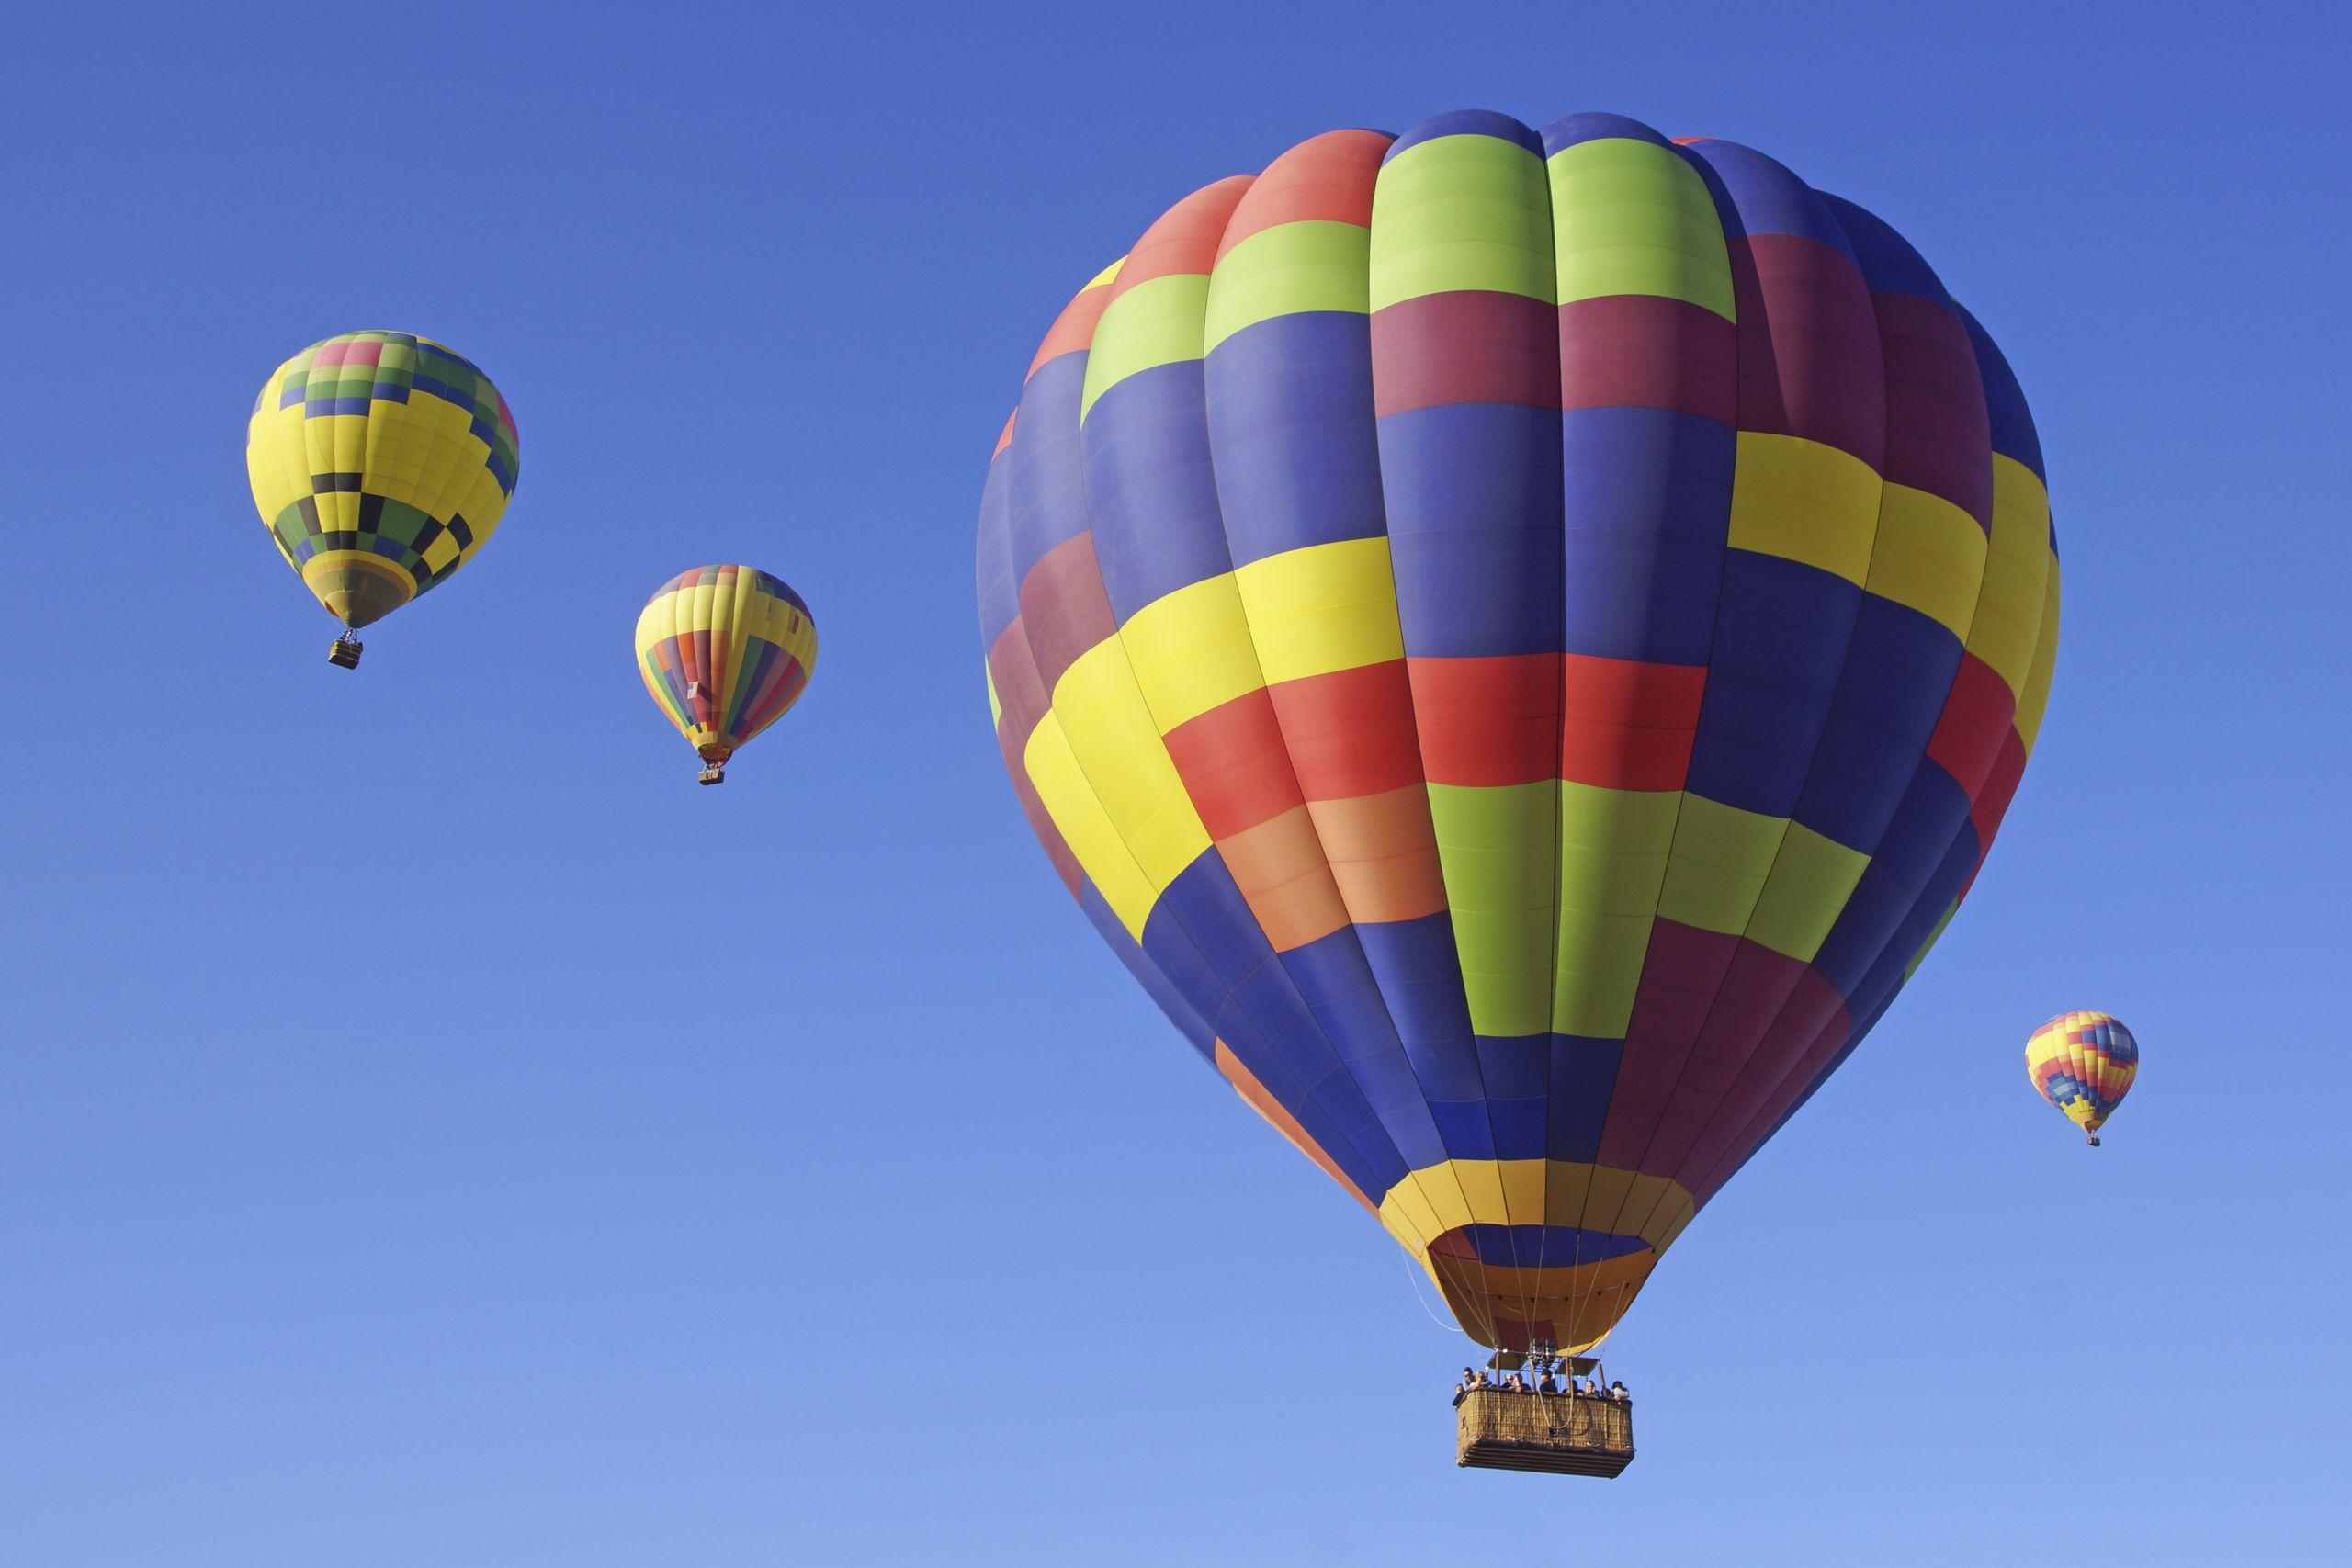 Ready for a hot air balloon ride?